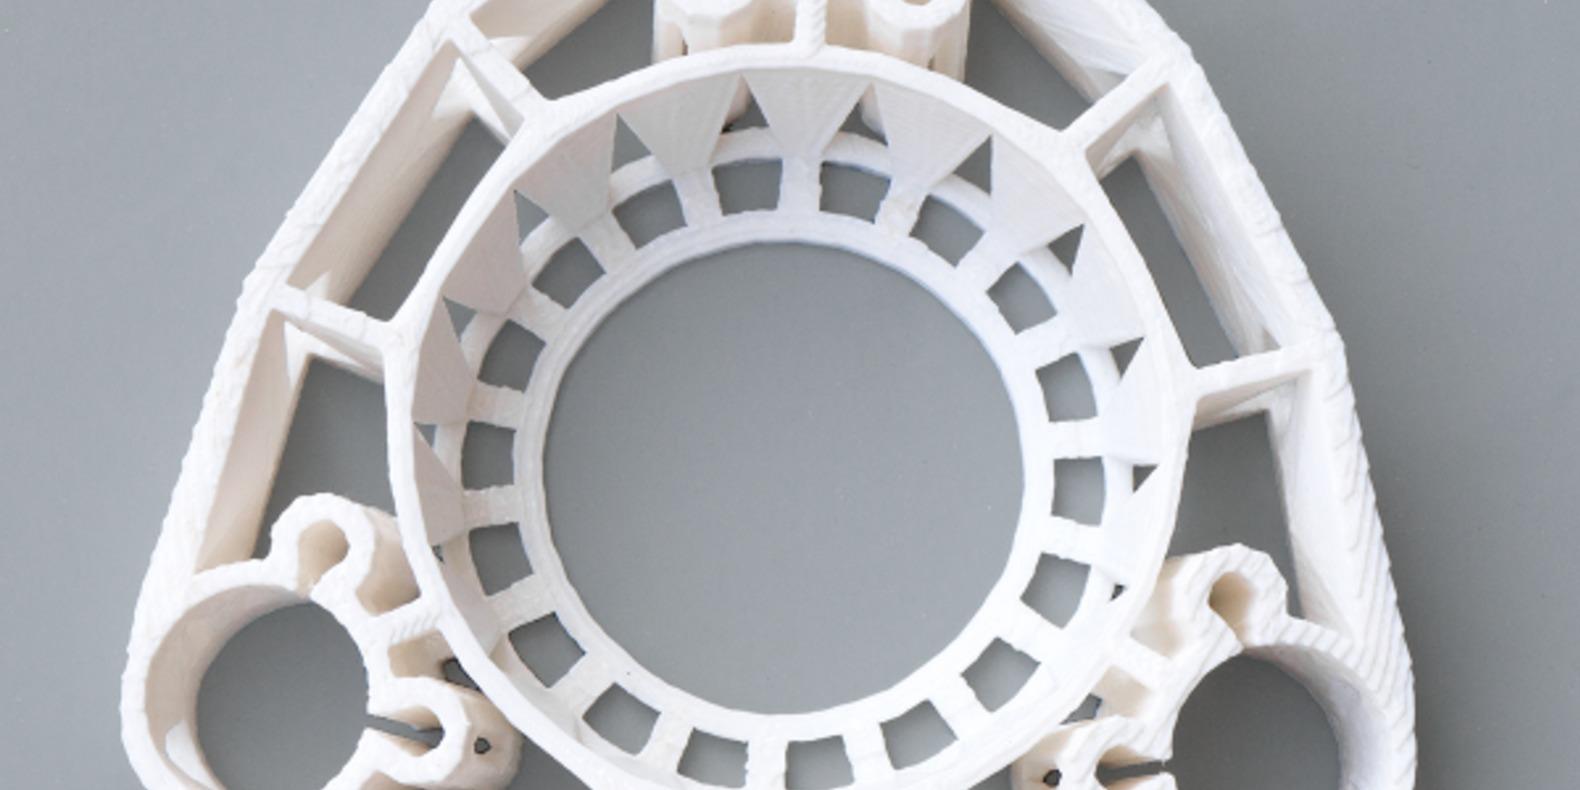 besenthal_04 MYO lampe imprimée en 3D lamp 3D printing impression 3D